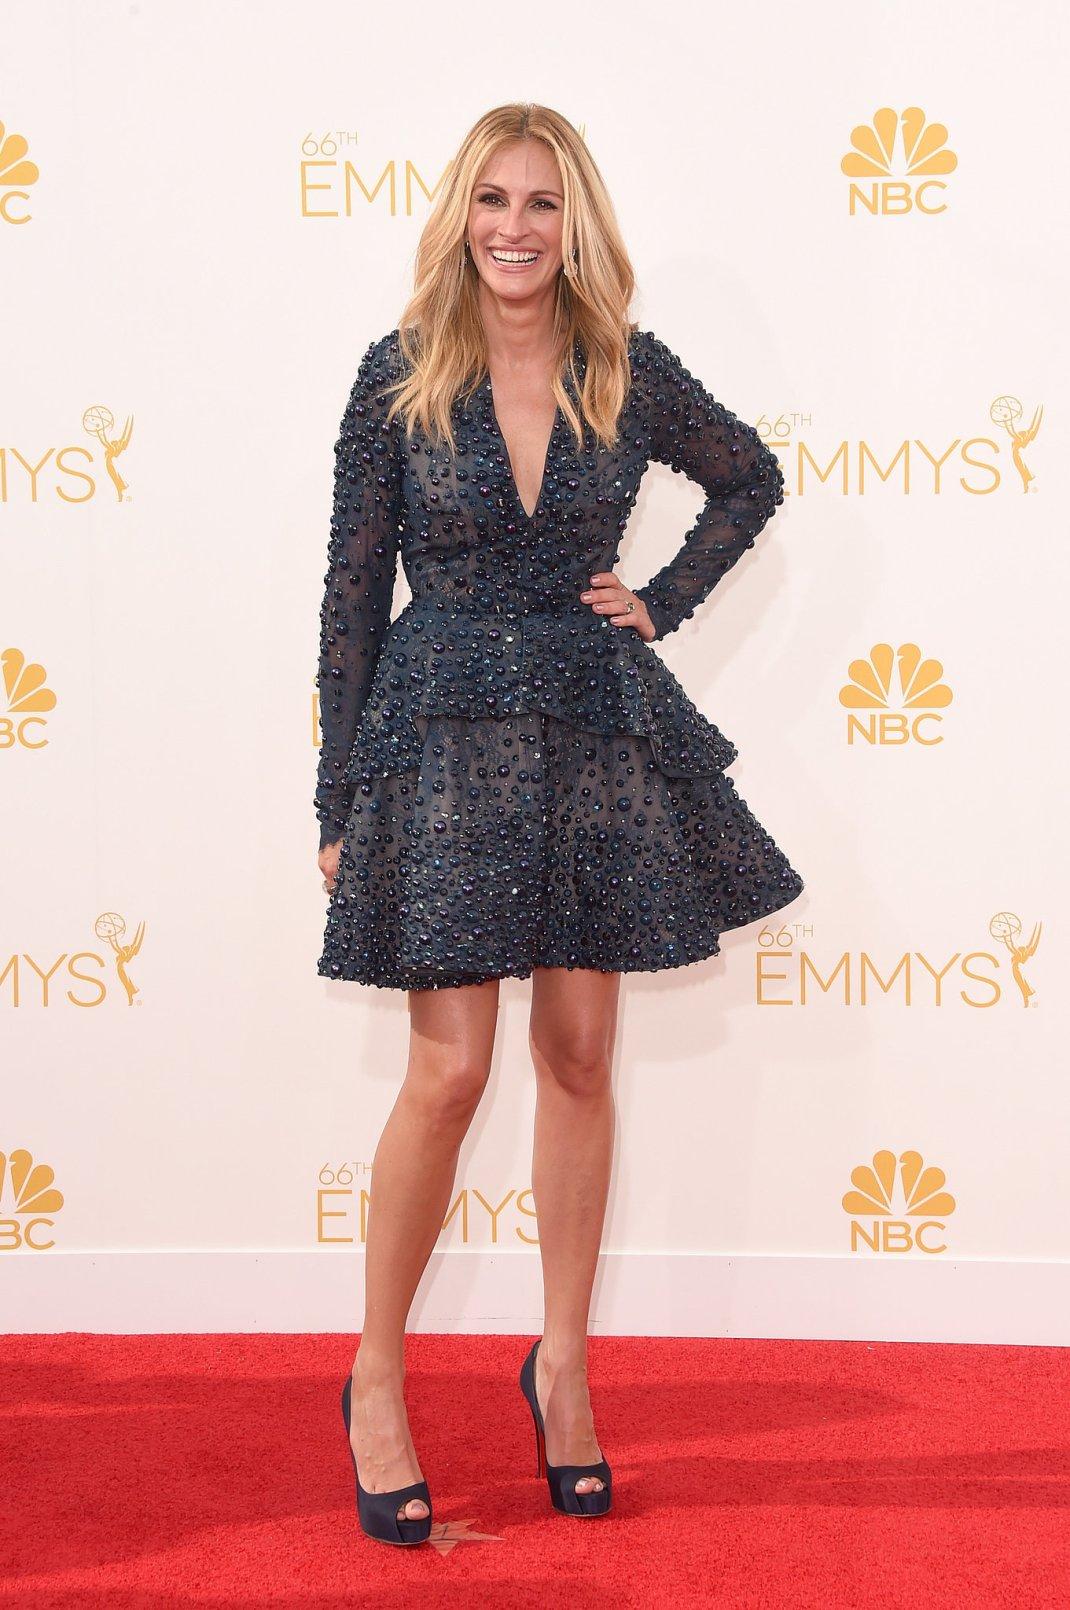 Julia-Roberts-2014-Emmy-Awards